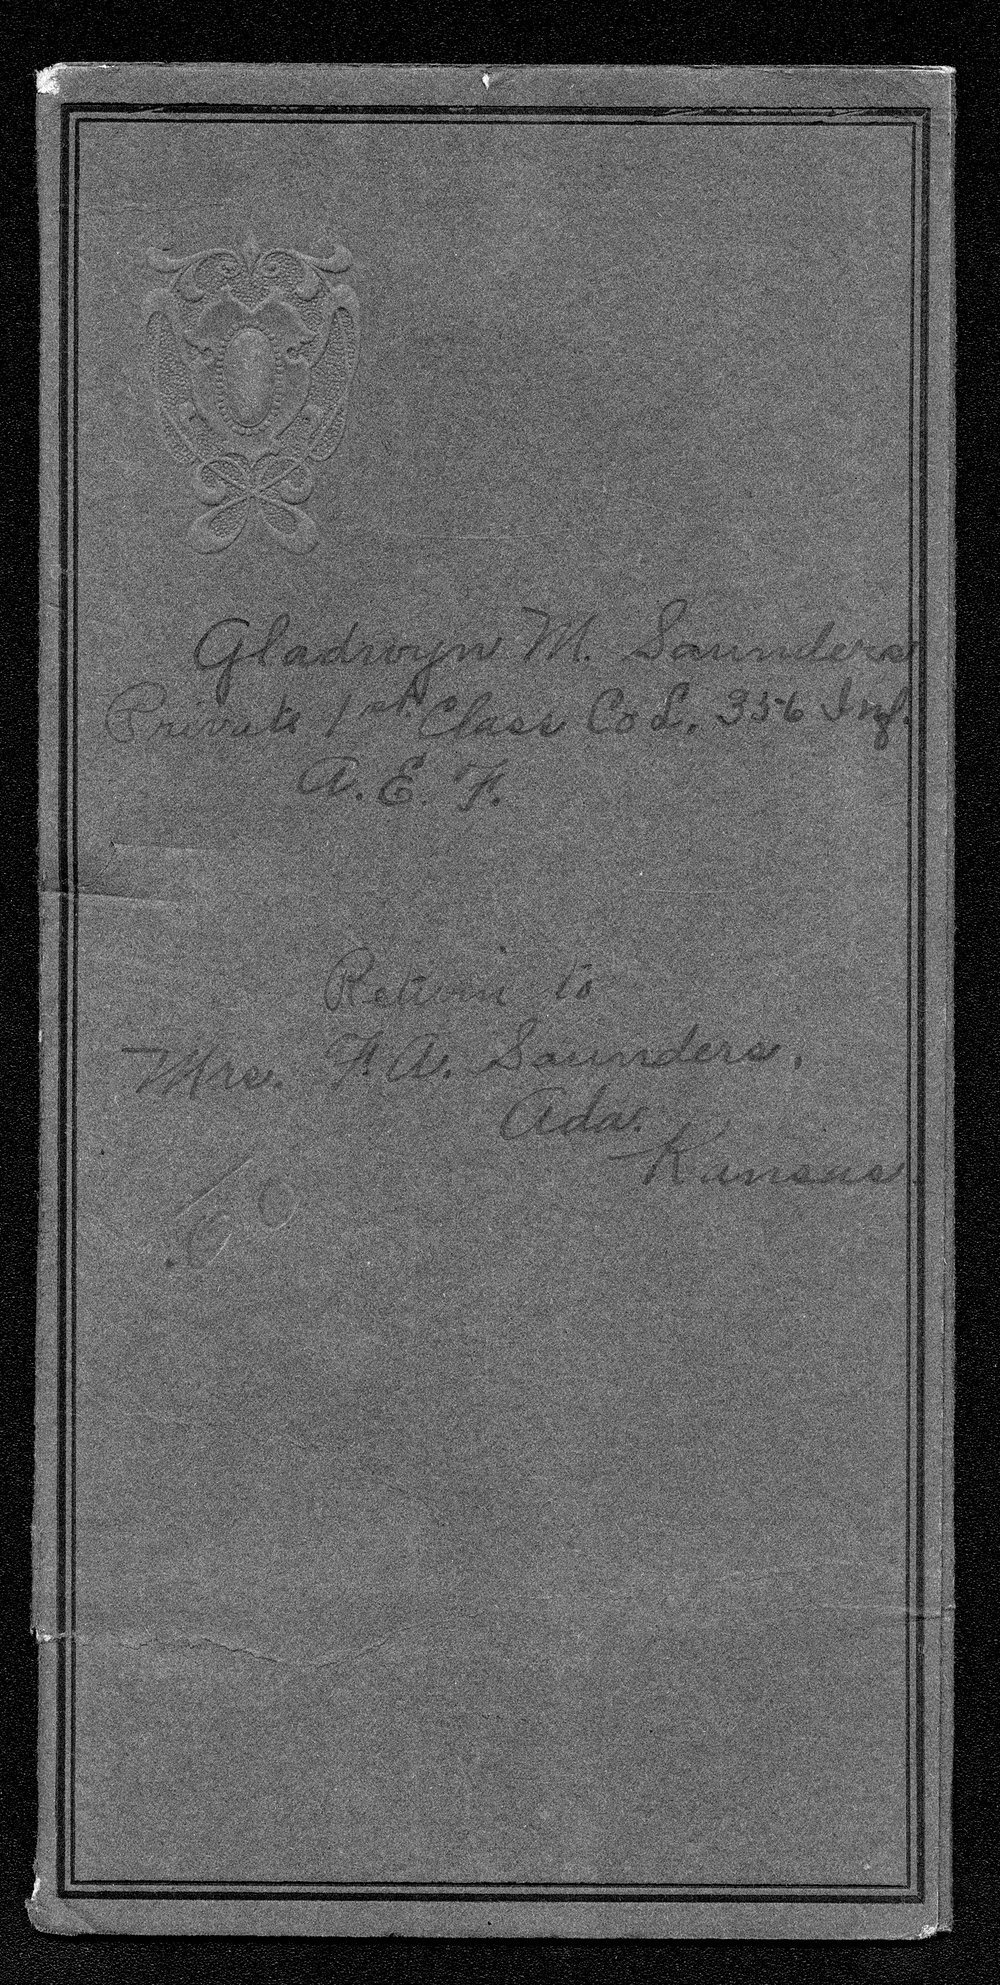 Gladwyn Mills Saunders, World War I soldier - 1